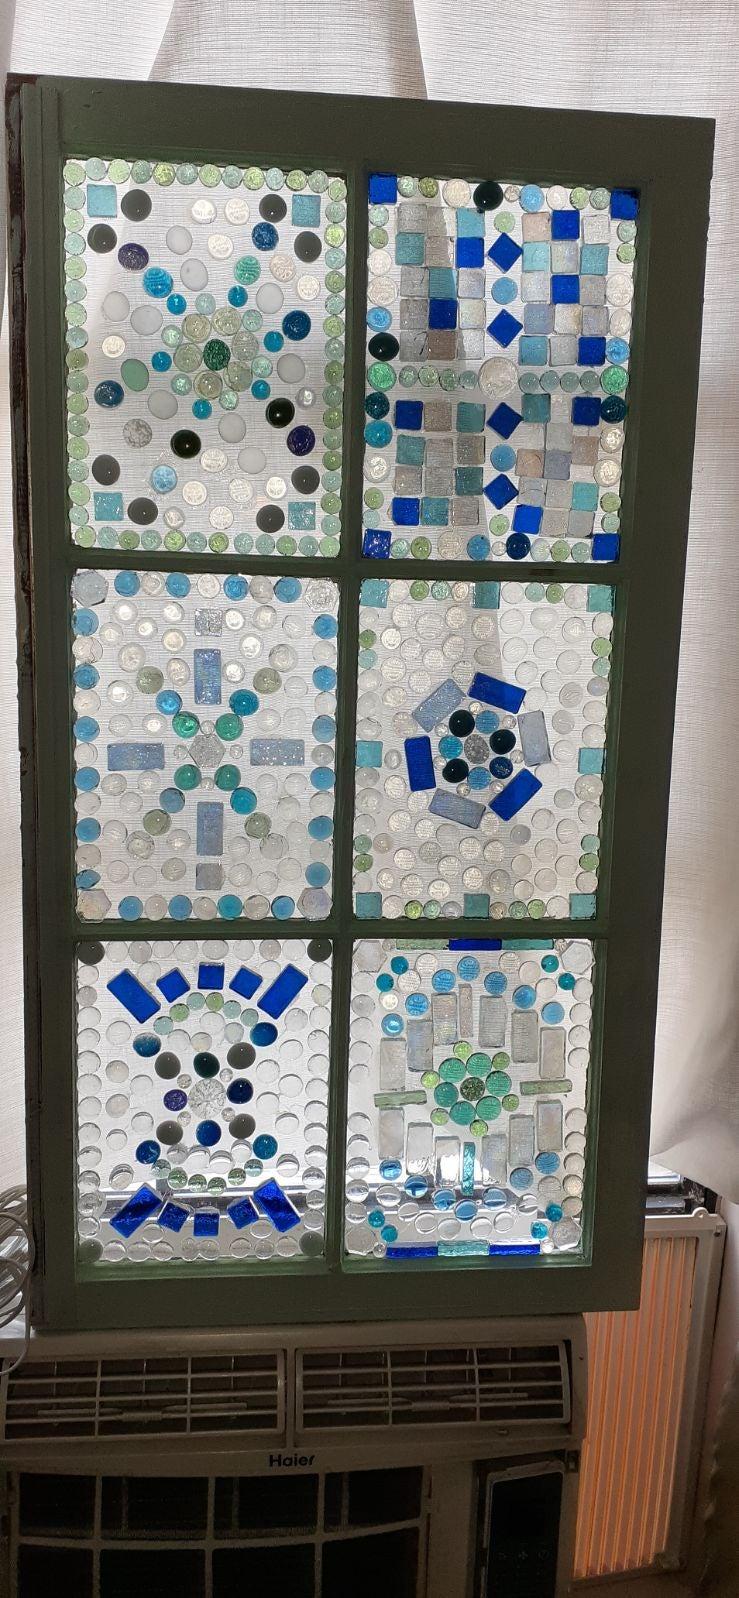 Mosaic tile window